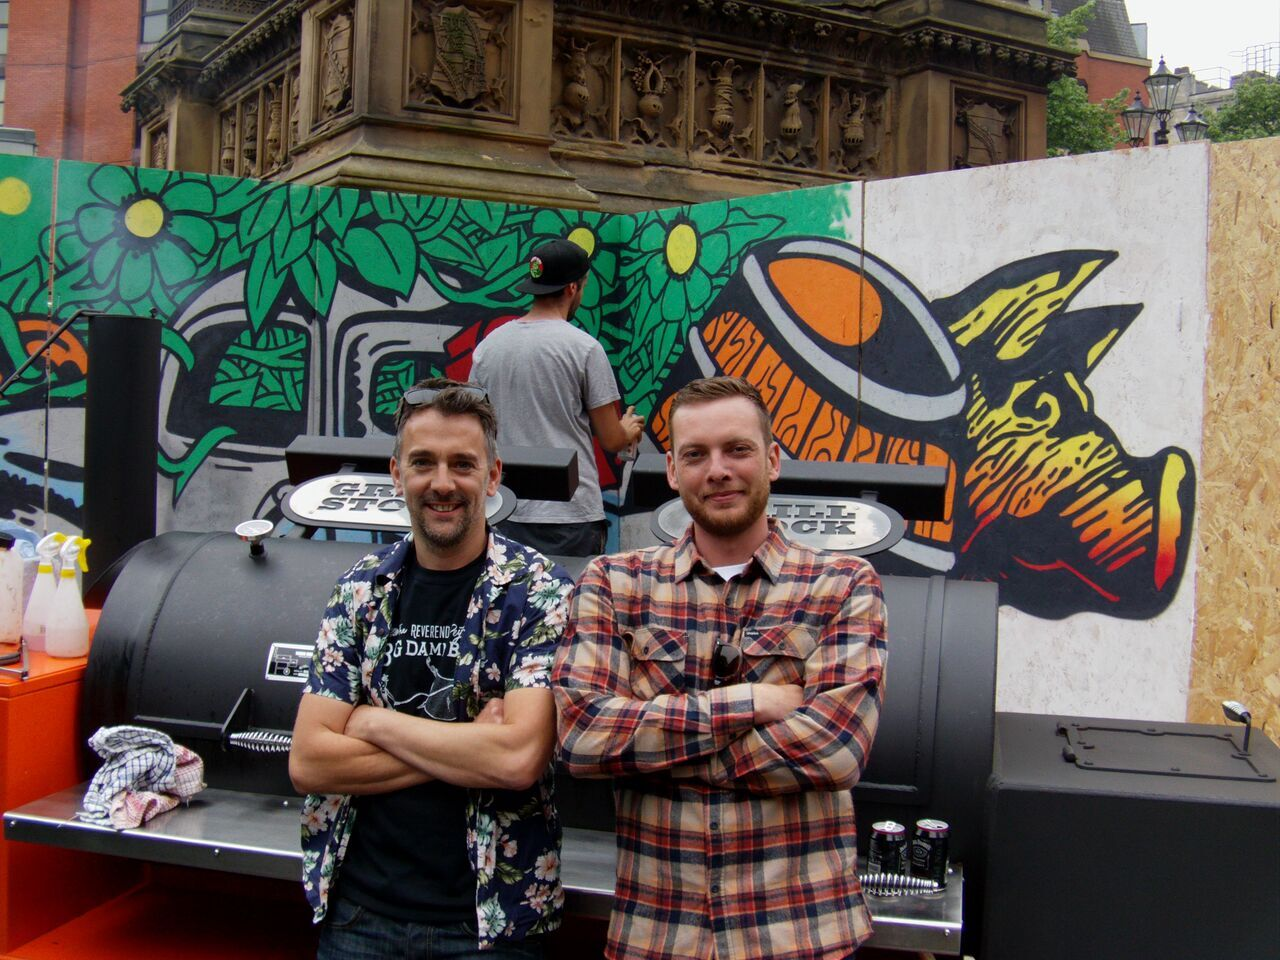 Grillstock co-founders Jon Finch and Ben Merrington